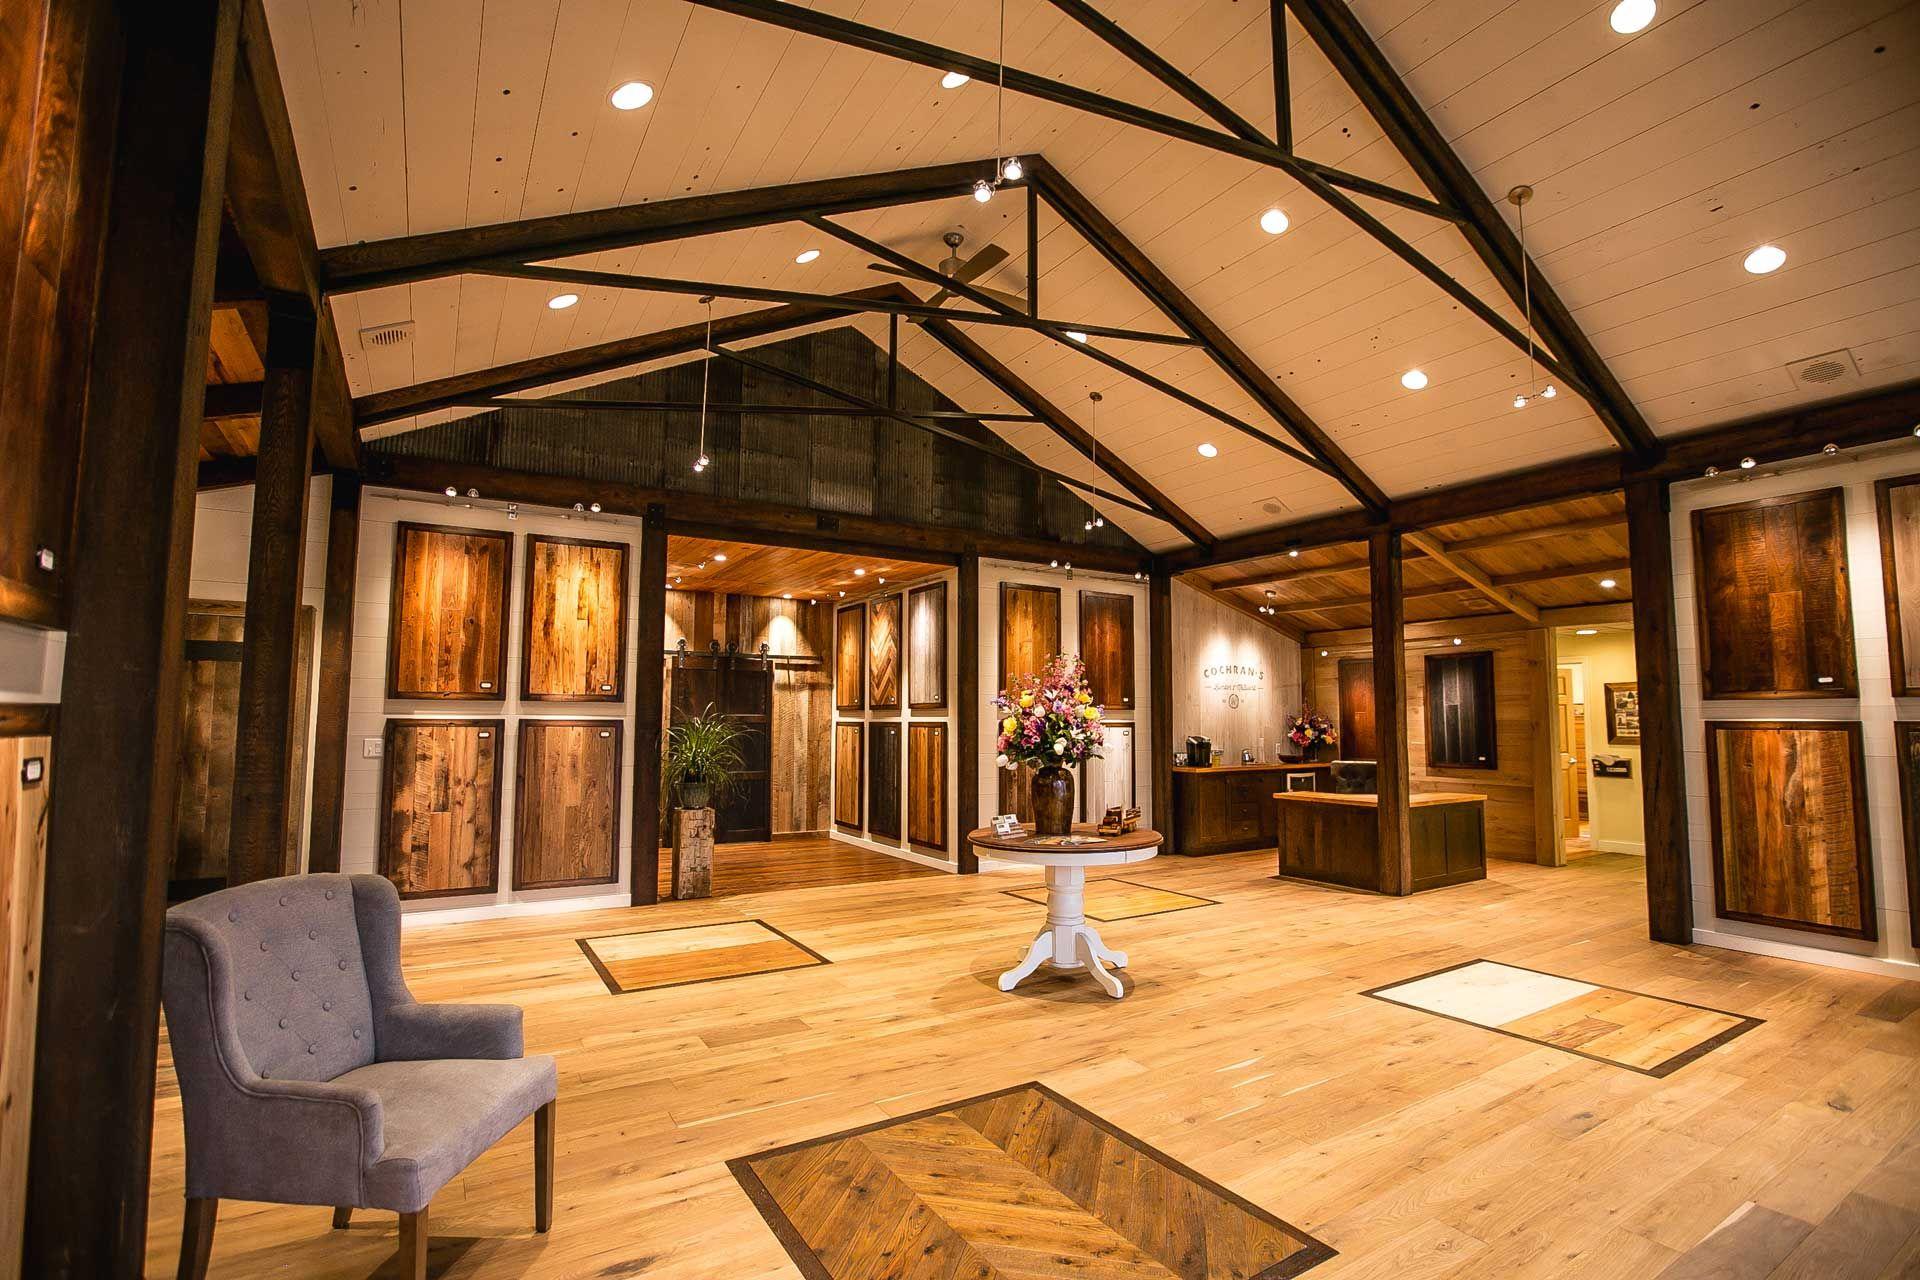 Home American Hardwood Flooring Cochrans Lumber